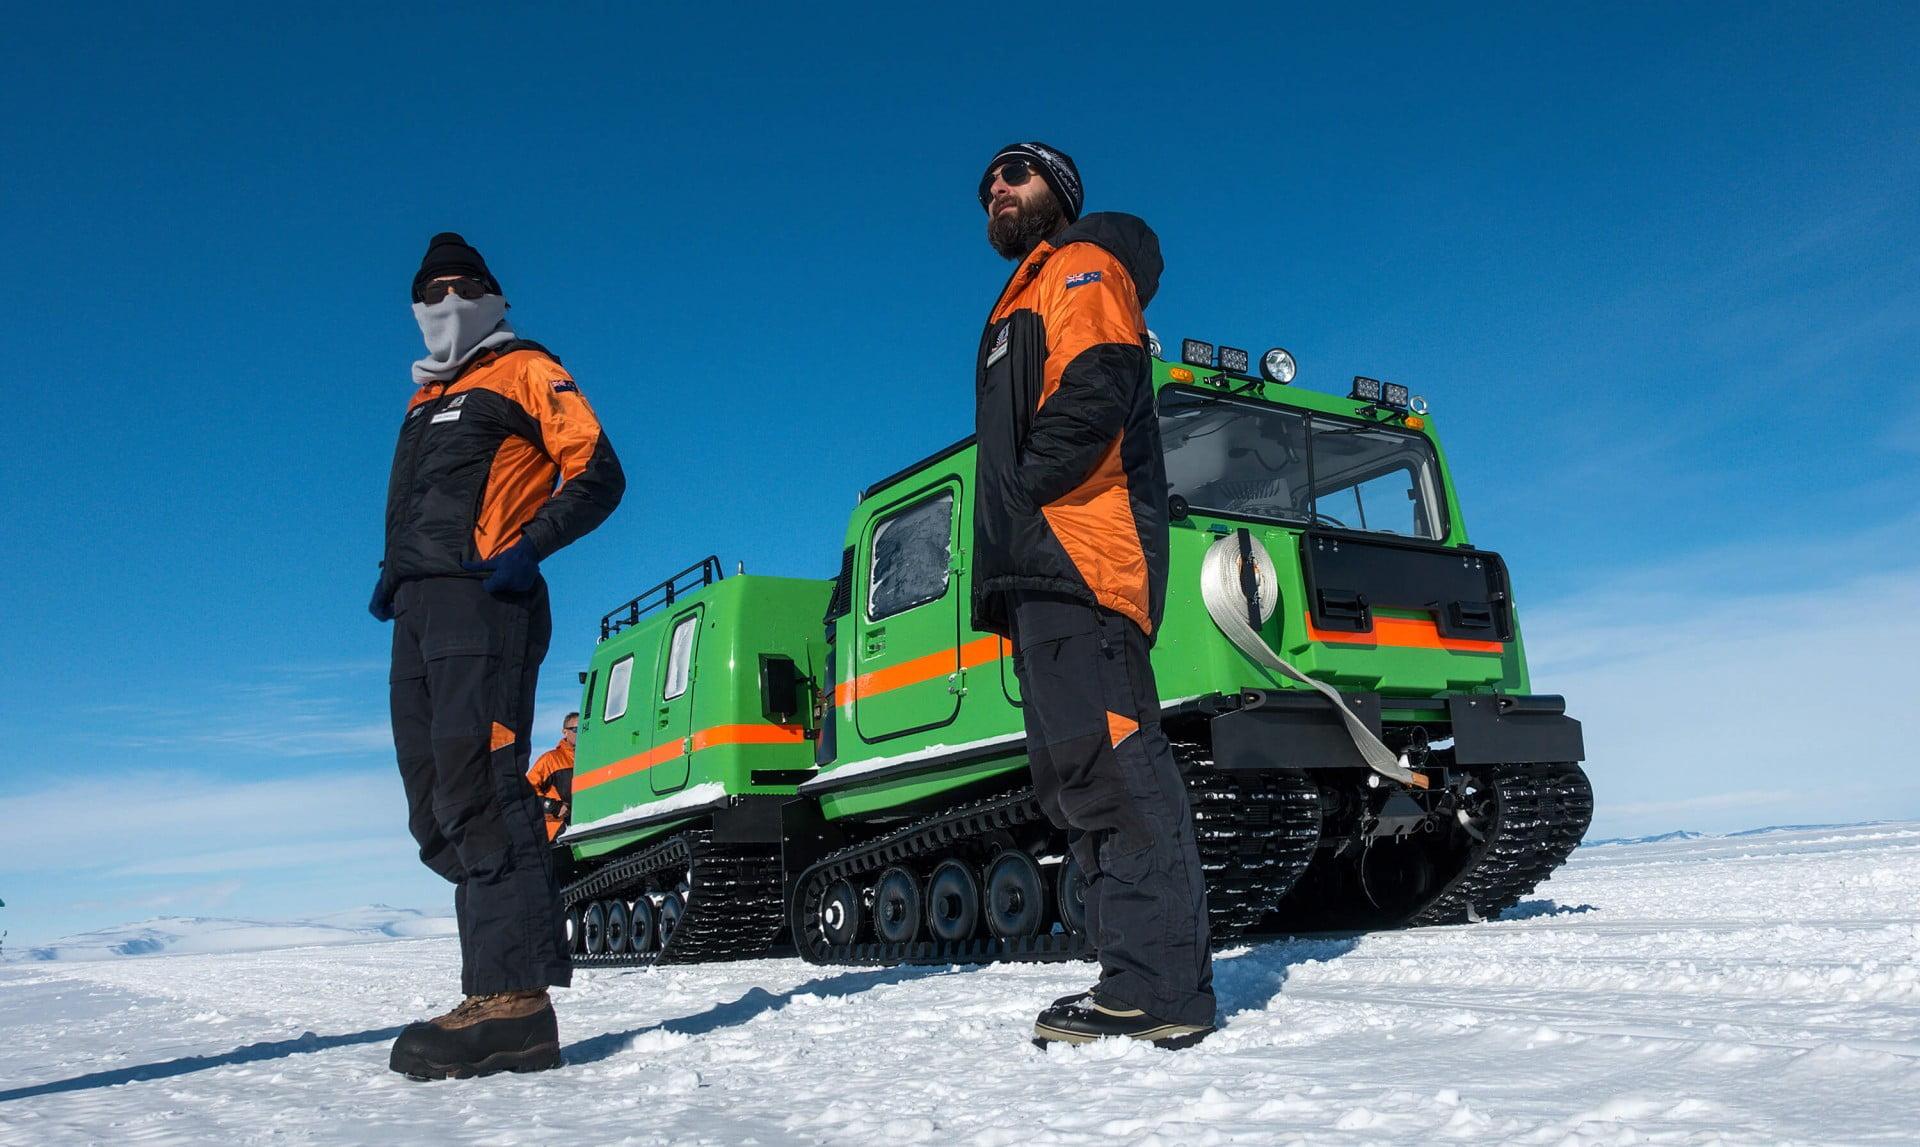 Hagglund on Ross Island, Antarctica.